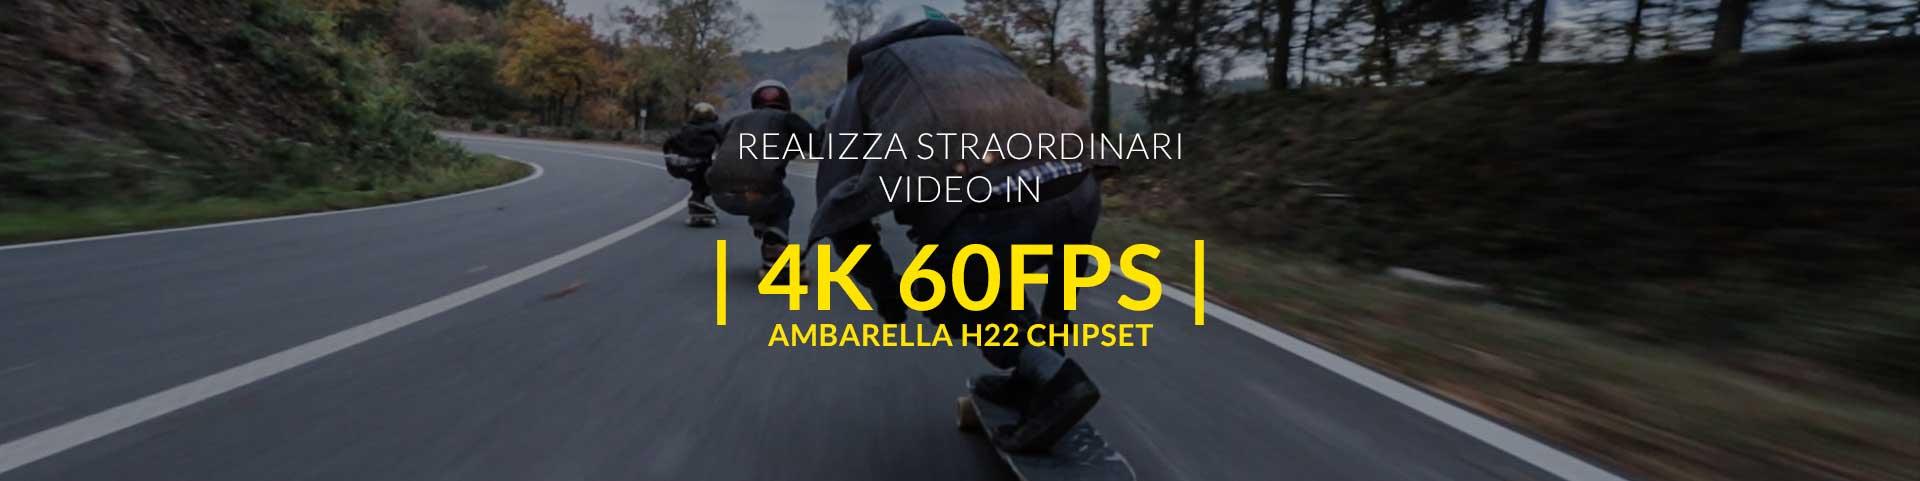 Sjcam Sjpro 4K